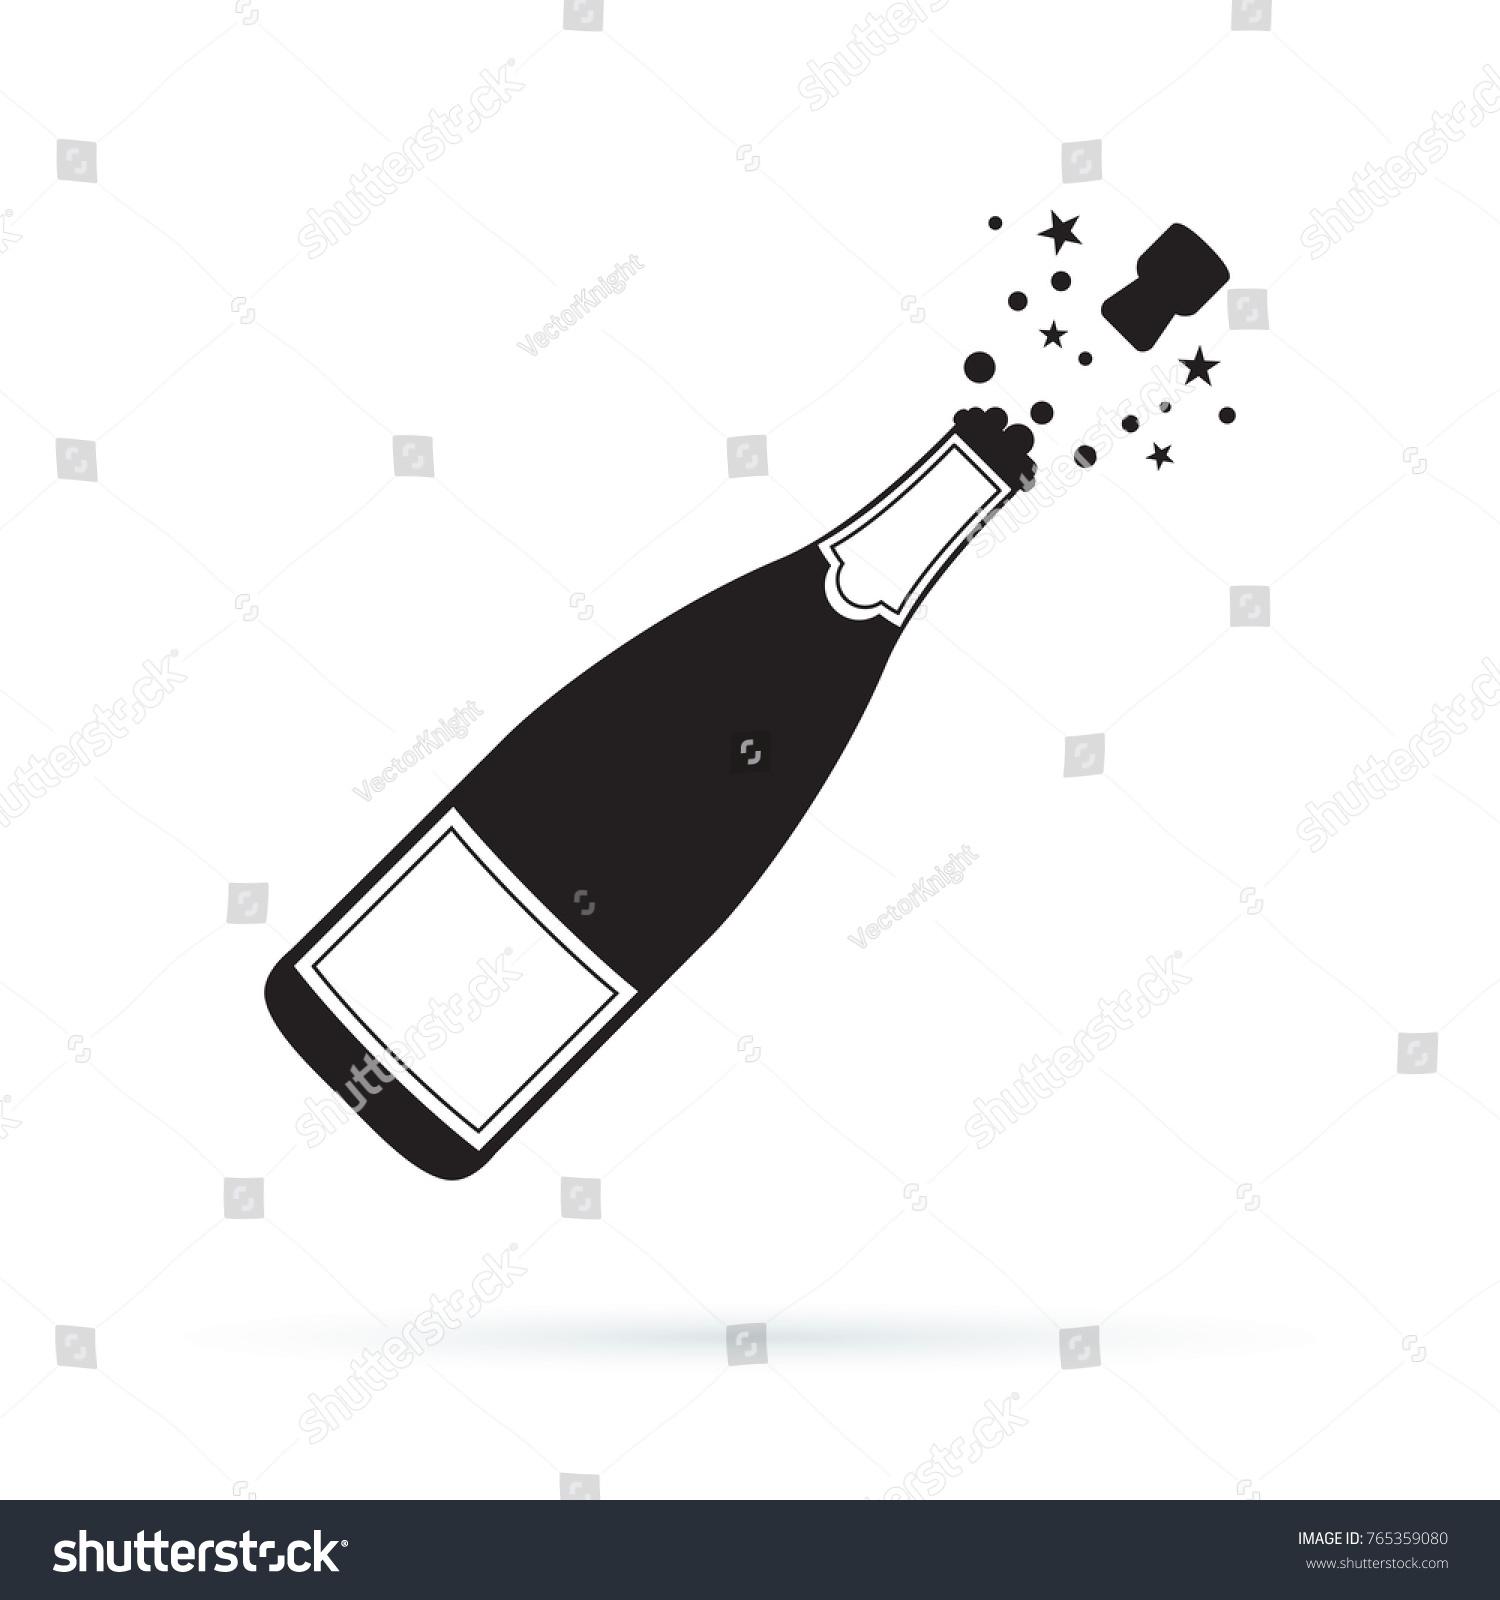 Night Sky 3d Wallpaper Popping Champagne Bottle Silhouette 37759 Tweb